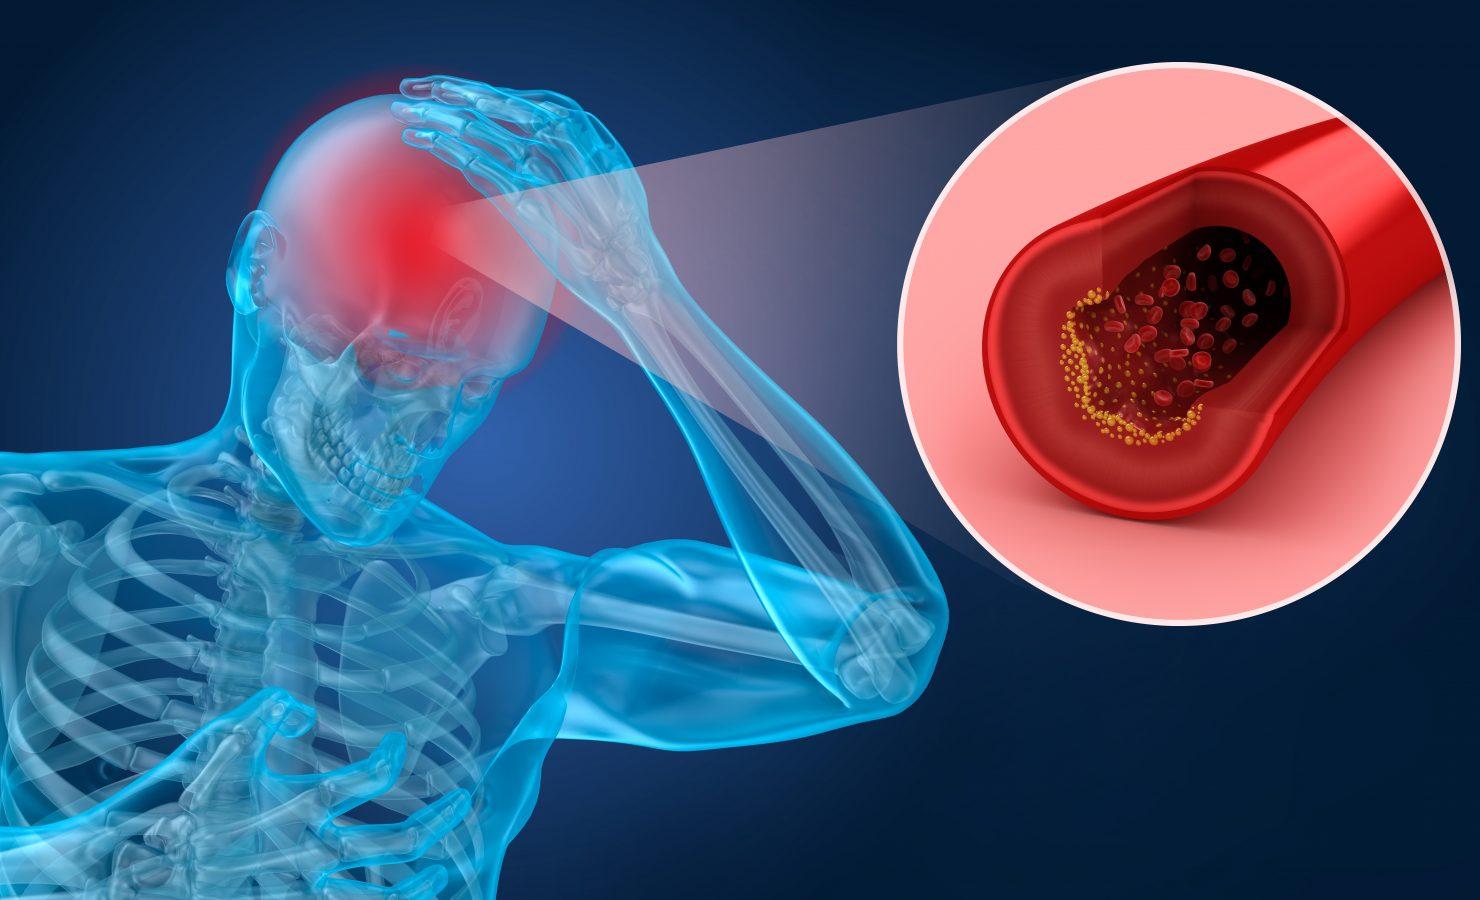 tratament articular după un accident vascular cerebral